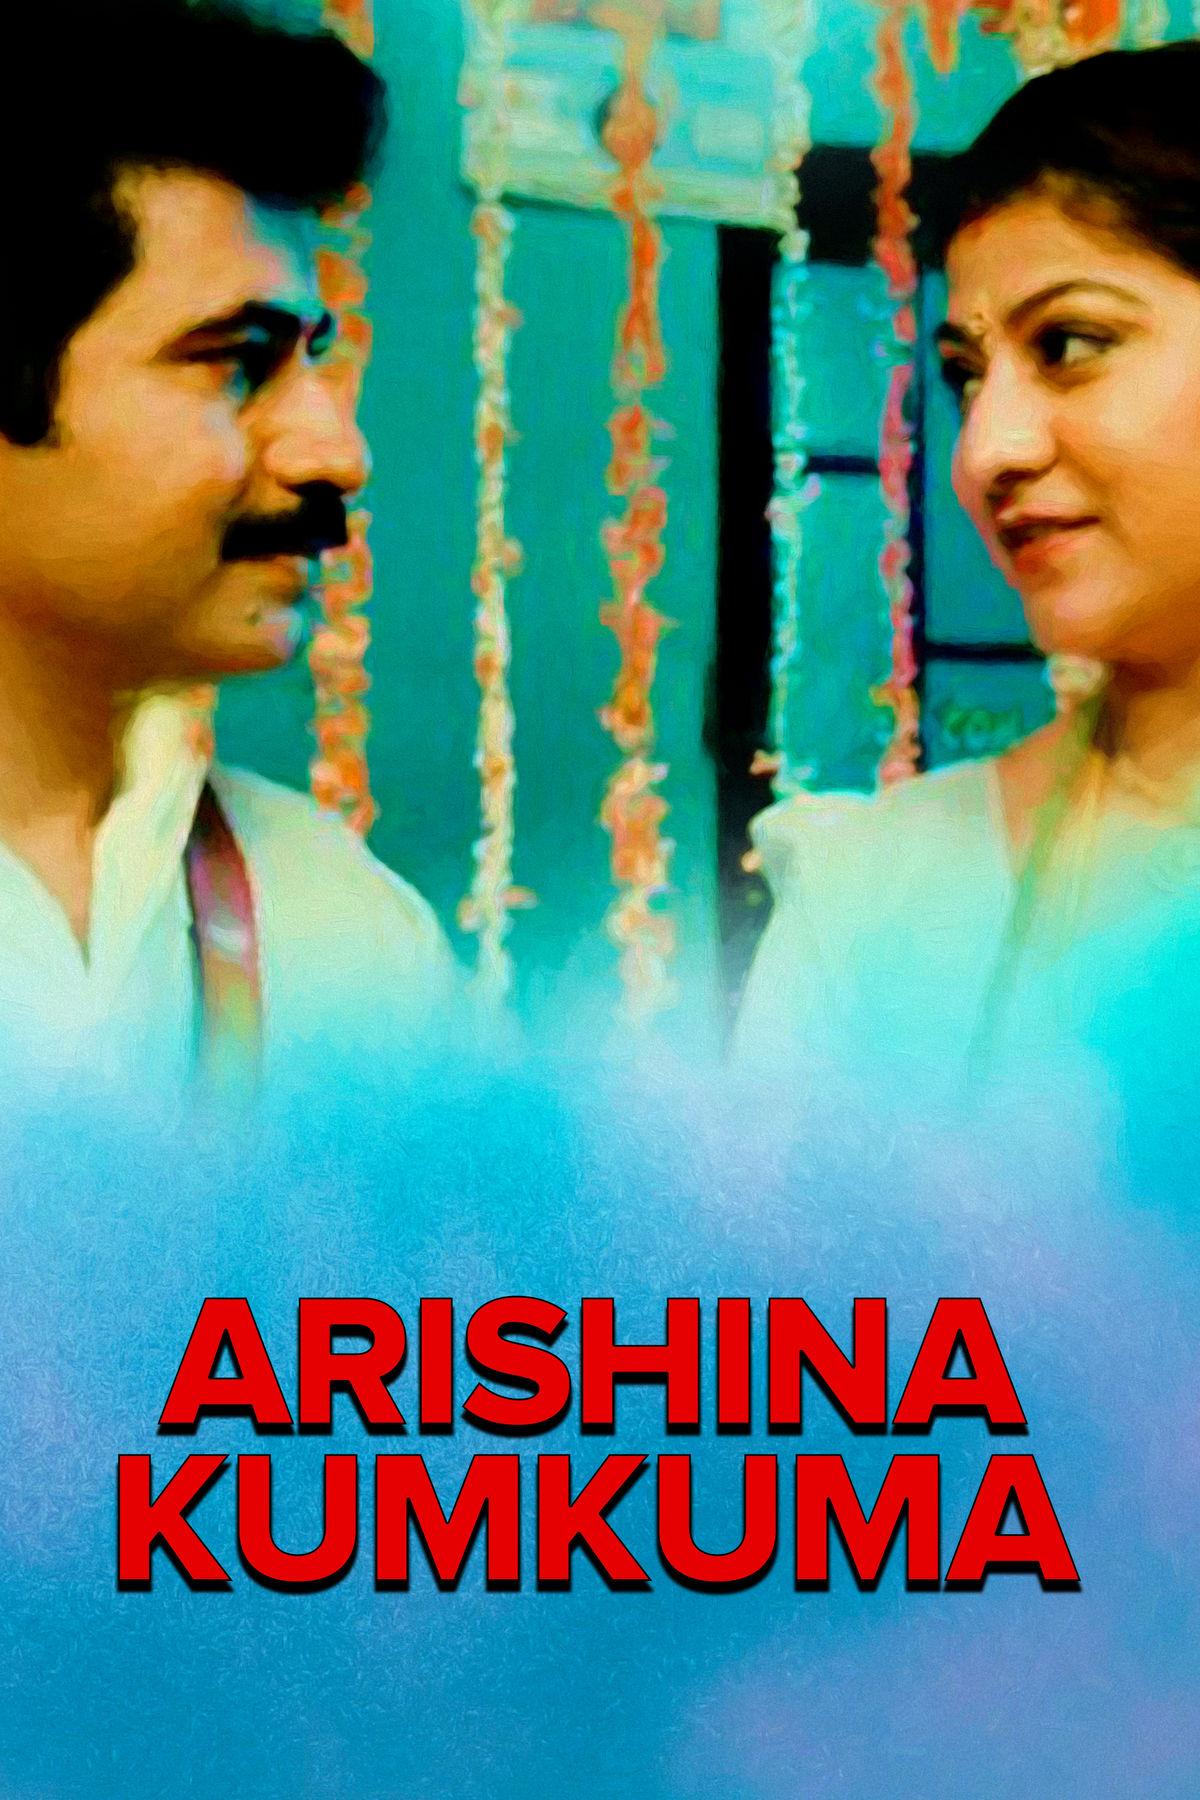 Arishina Kumkuma - 1996